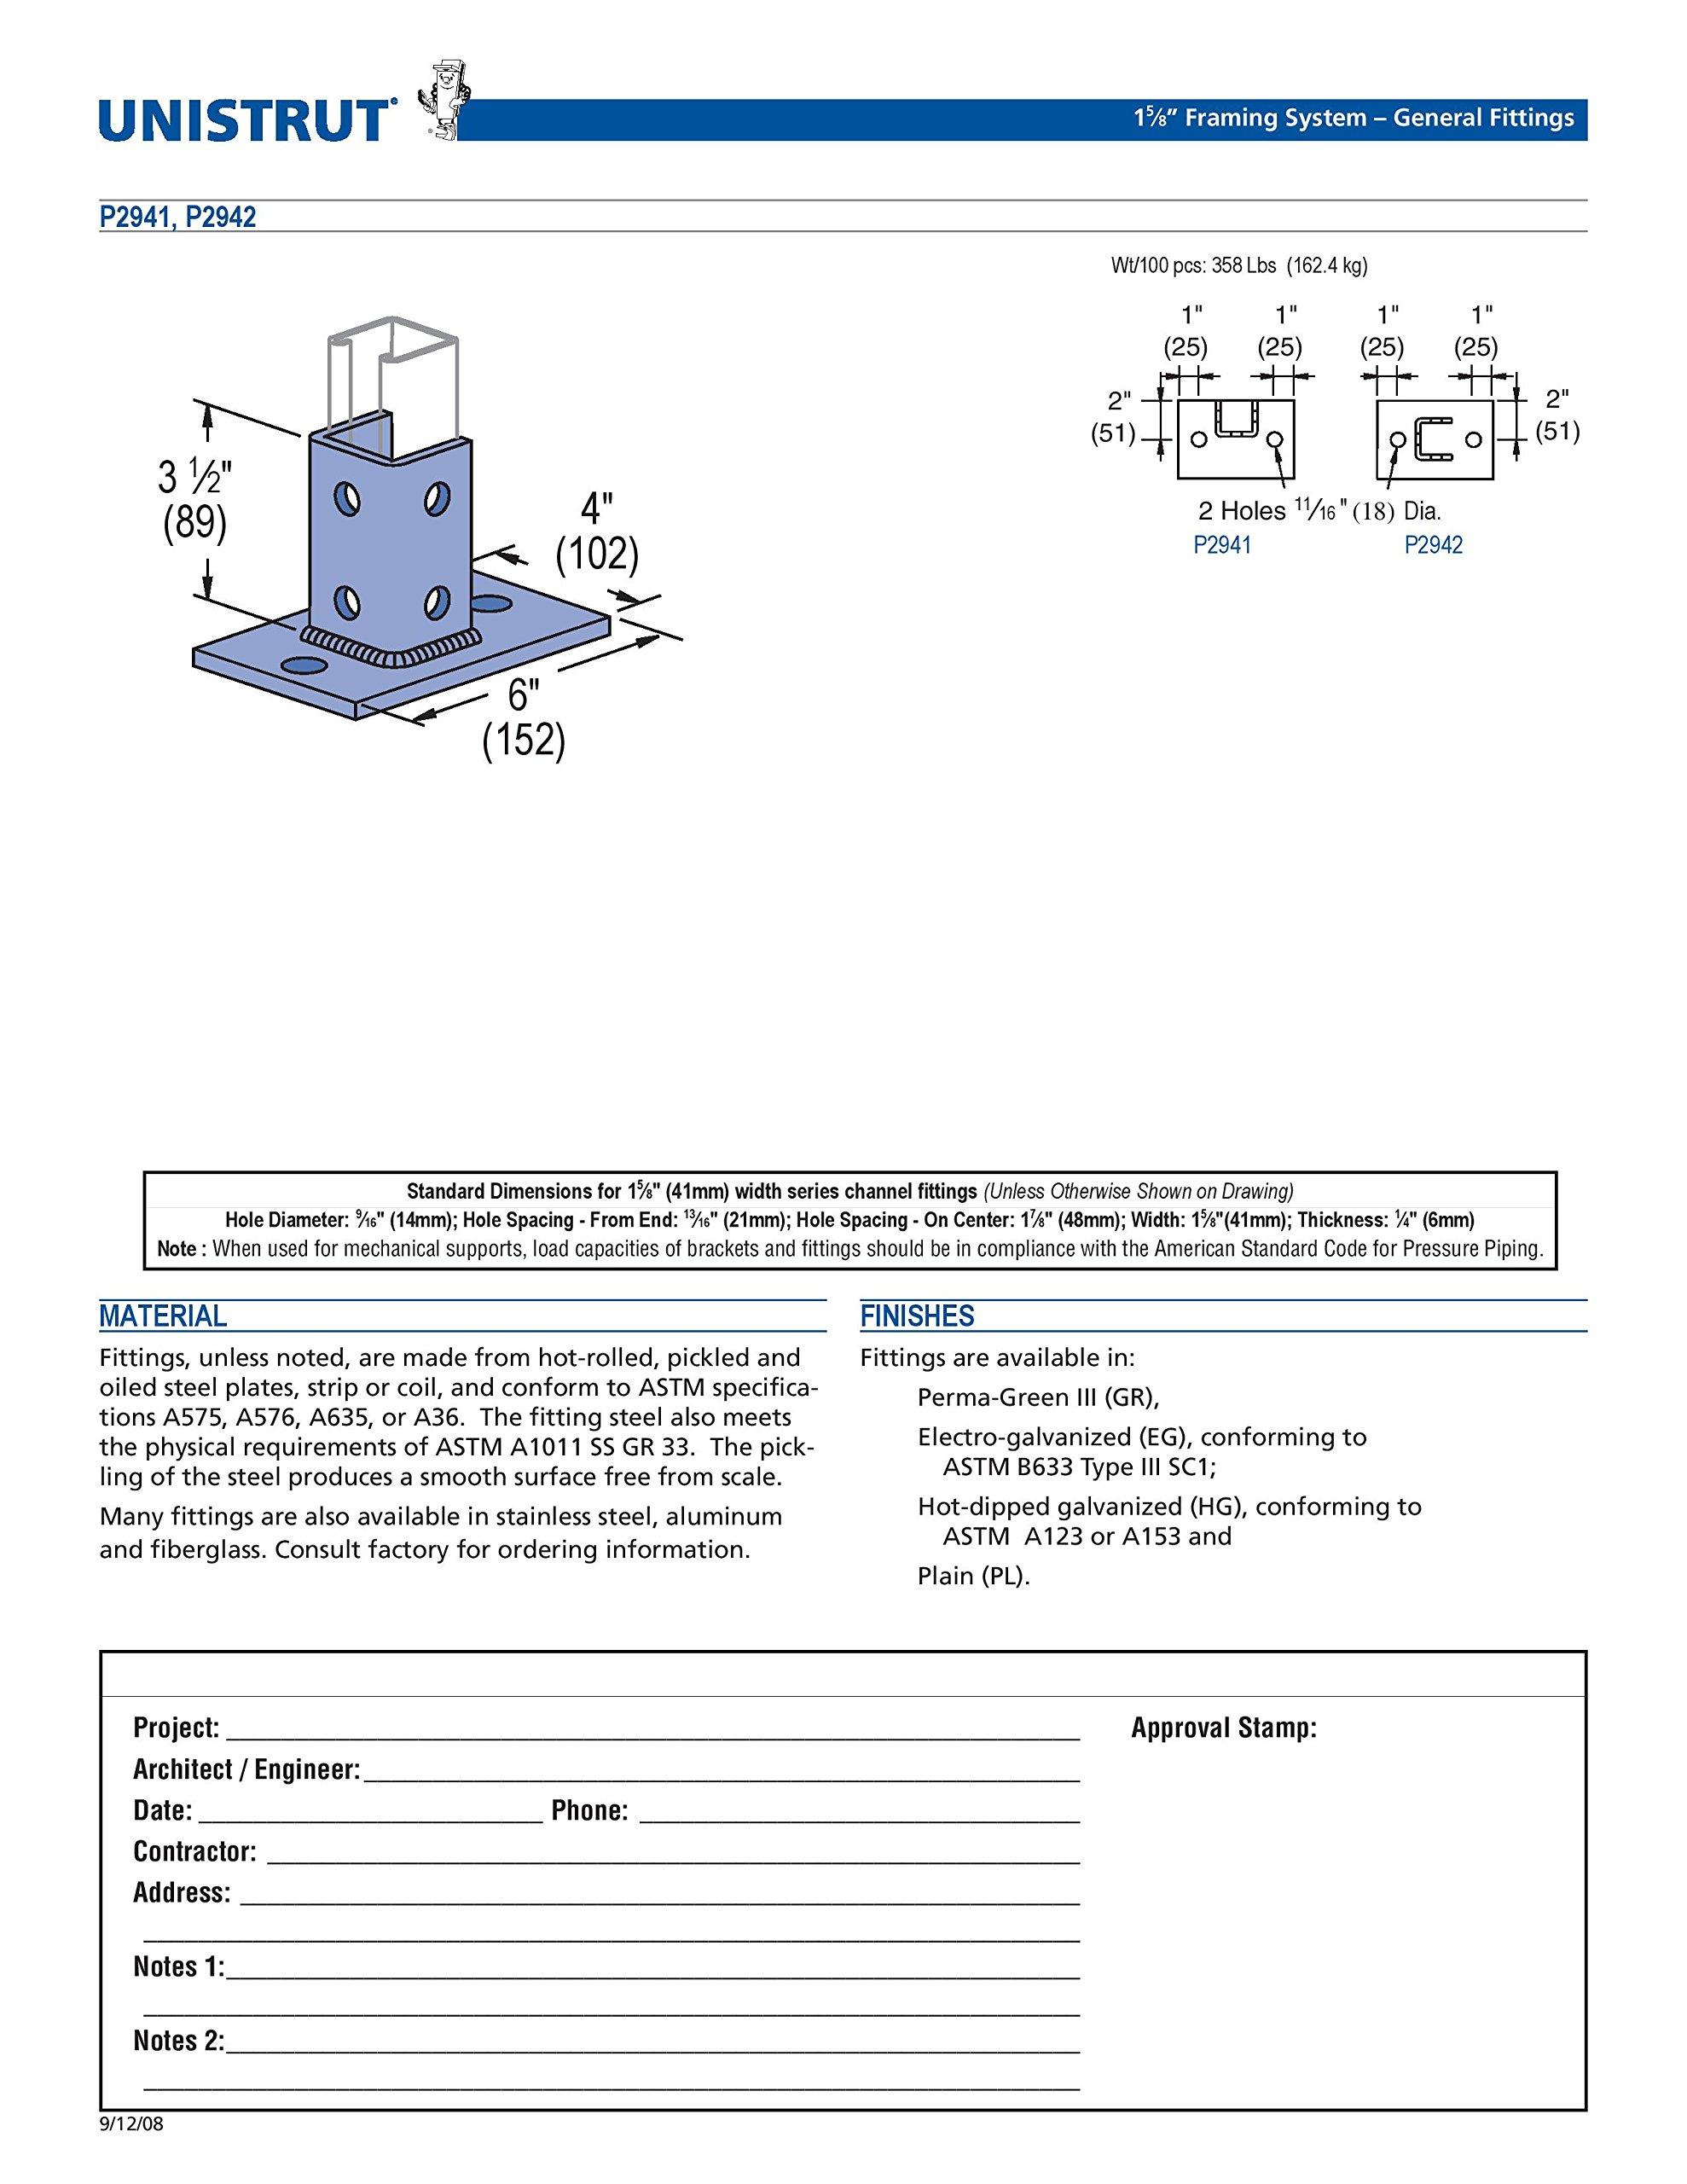 Unistrut P2942-EG Post Base Single Channel, 2 Hole, Standard, 3-1/2'' Channel